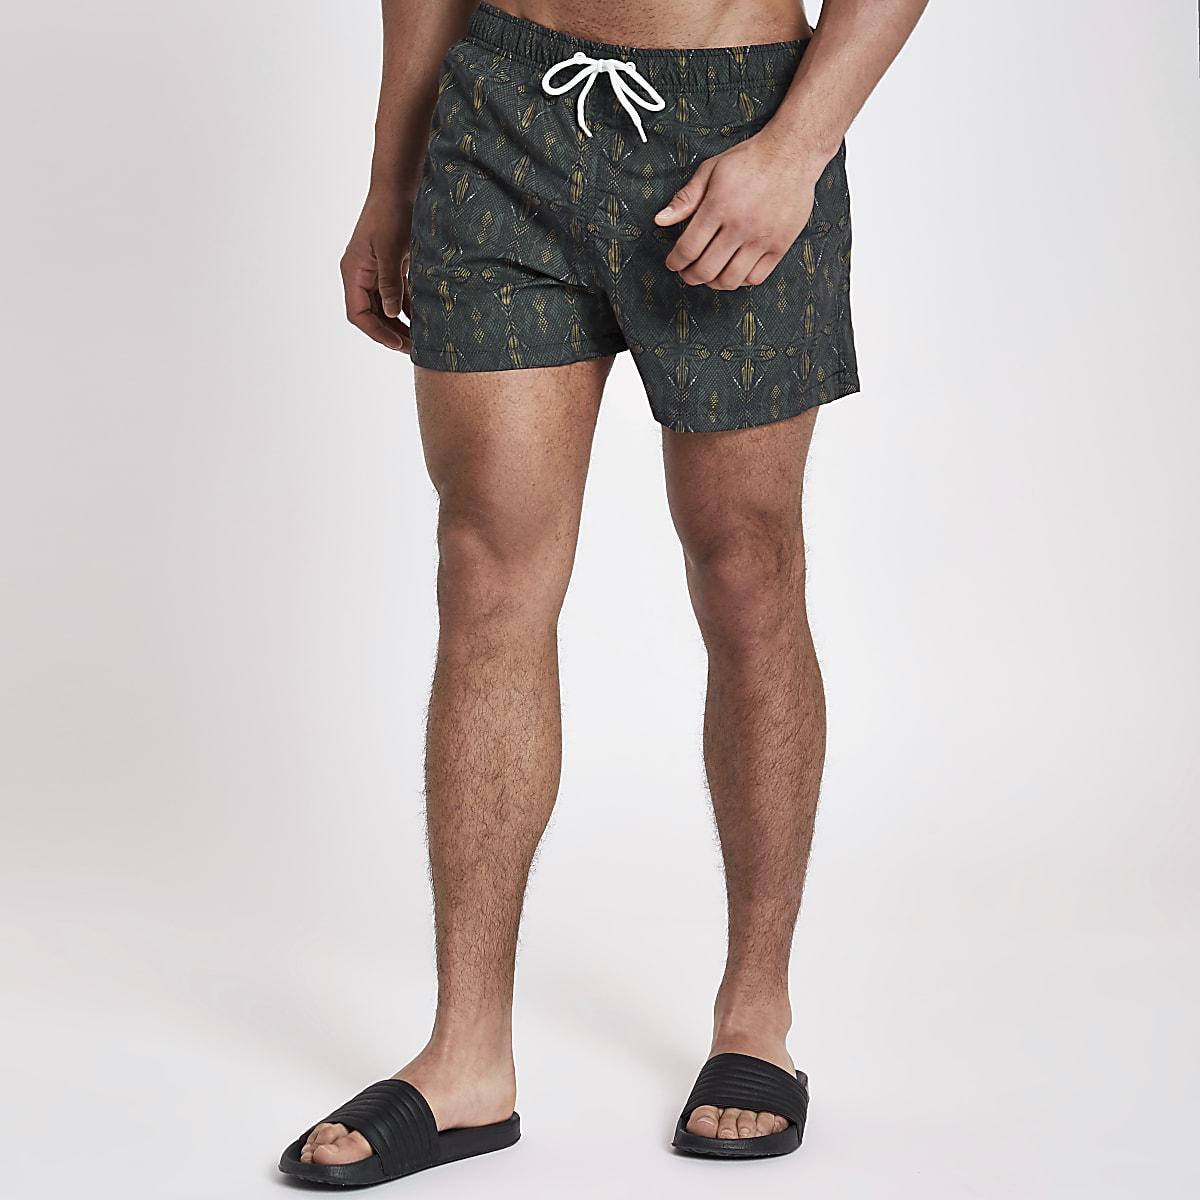 Green aztec print short swim shorts